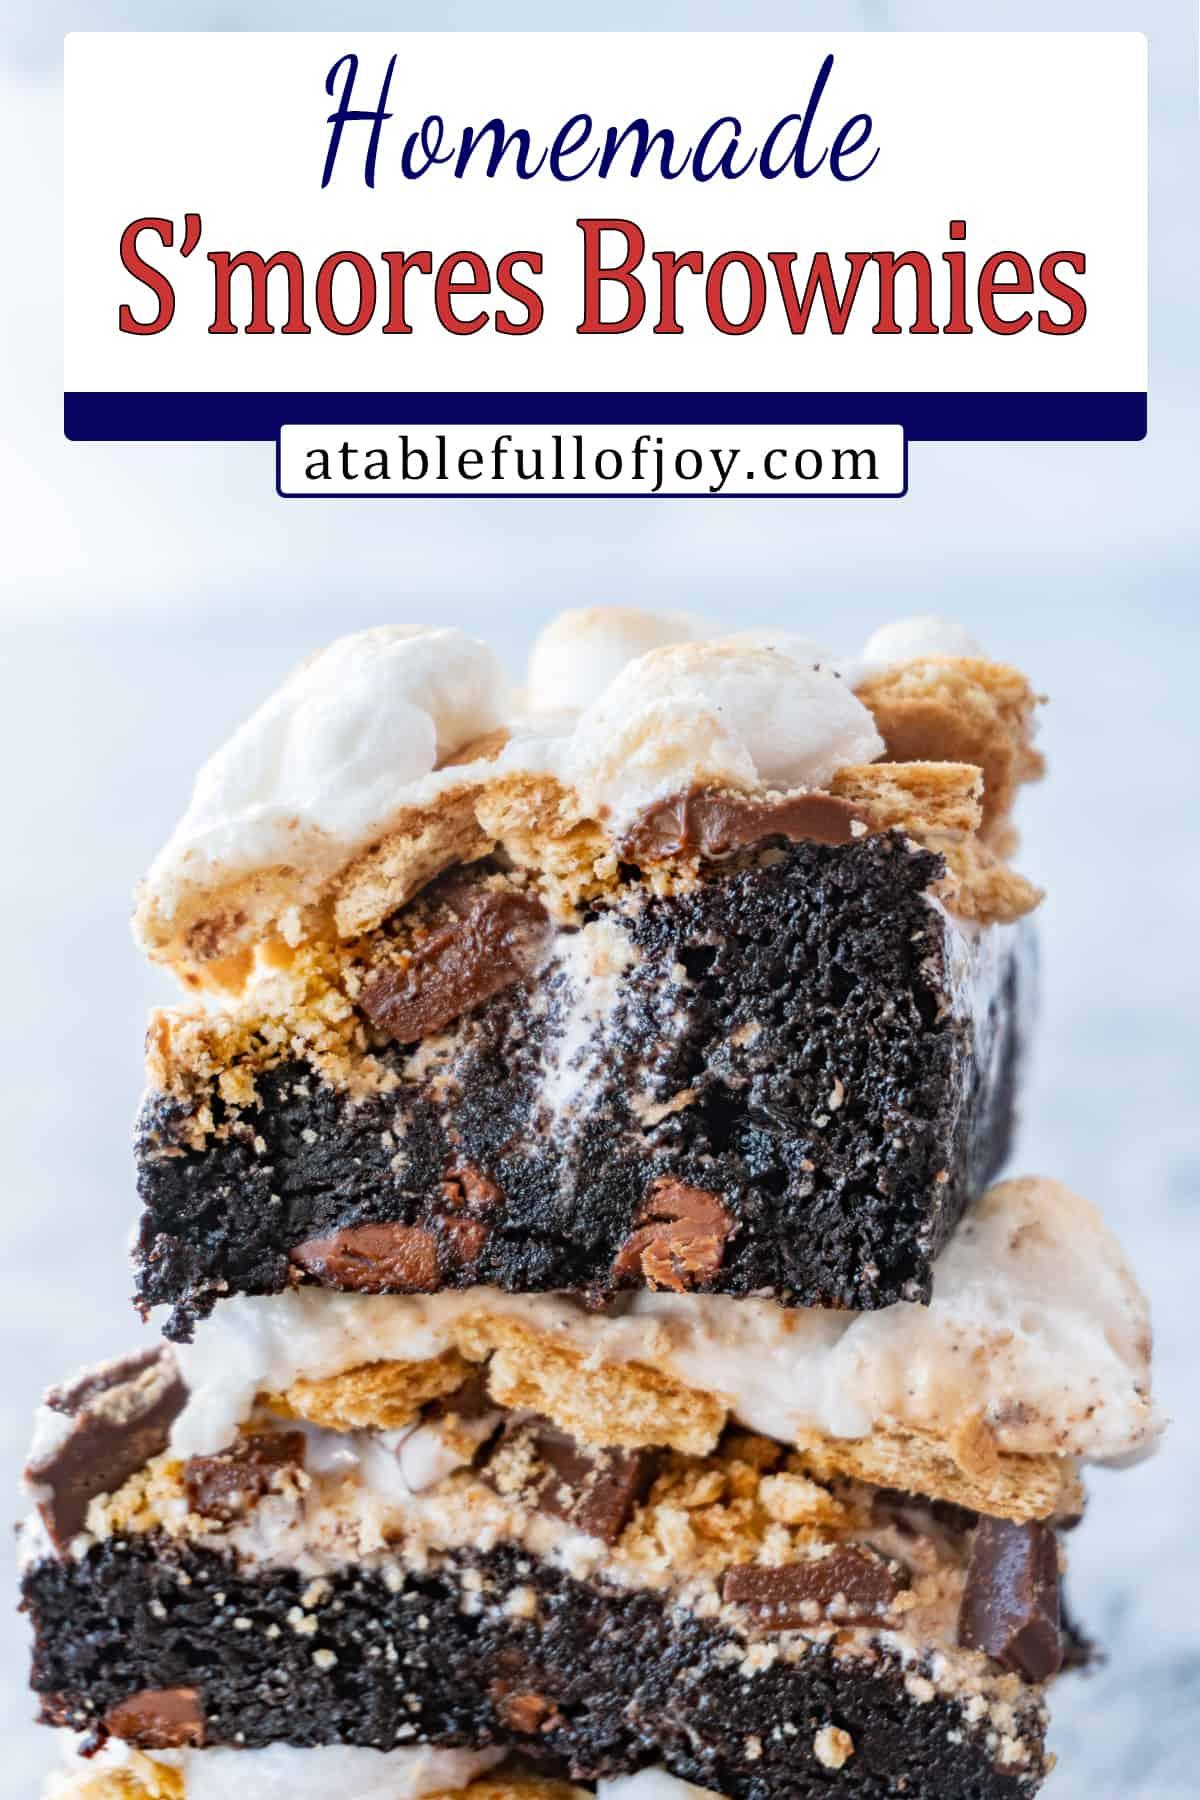 s'more brownies recipe pinterest pin